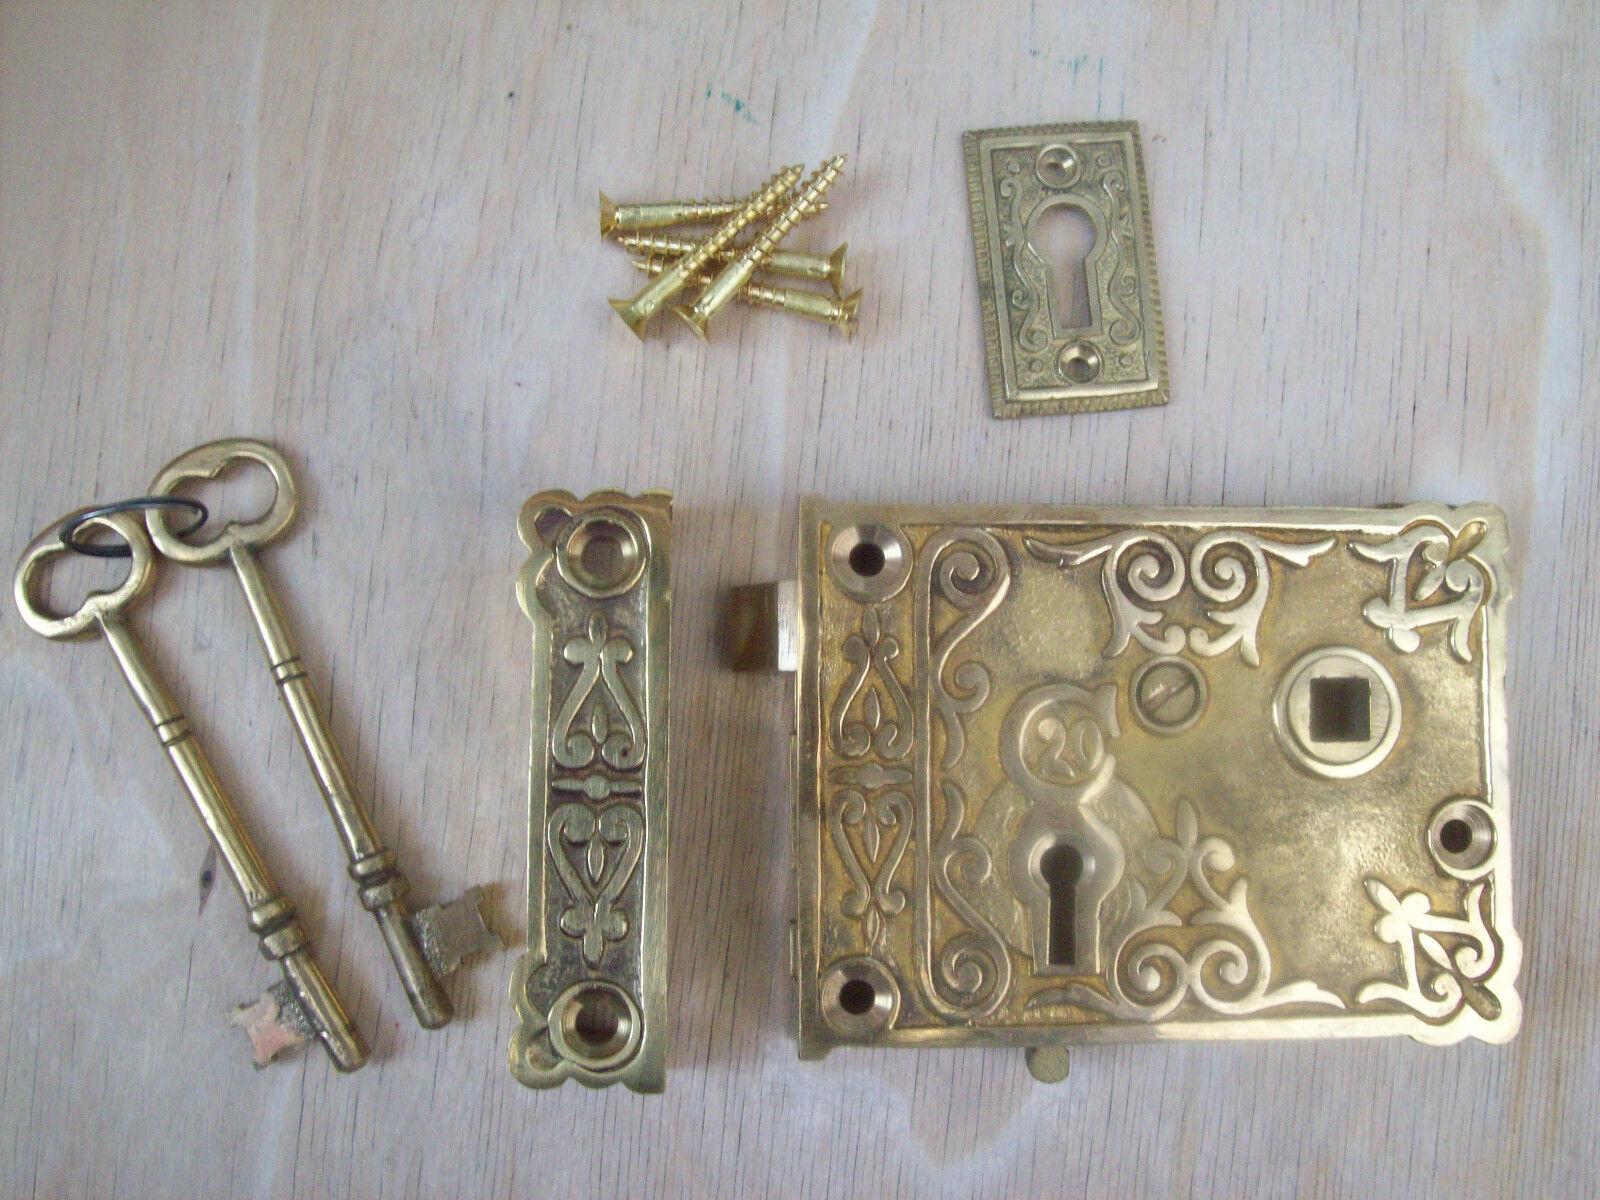 Fancy Ornate Decorative Old Victorian Style Solid Brass Door Rim Lock Knob Set Cad